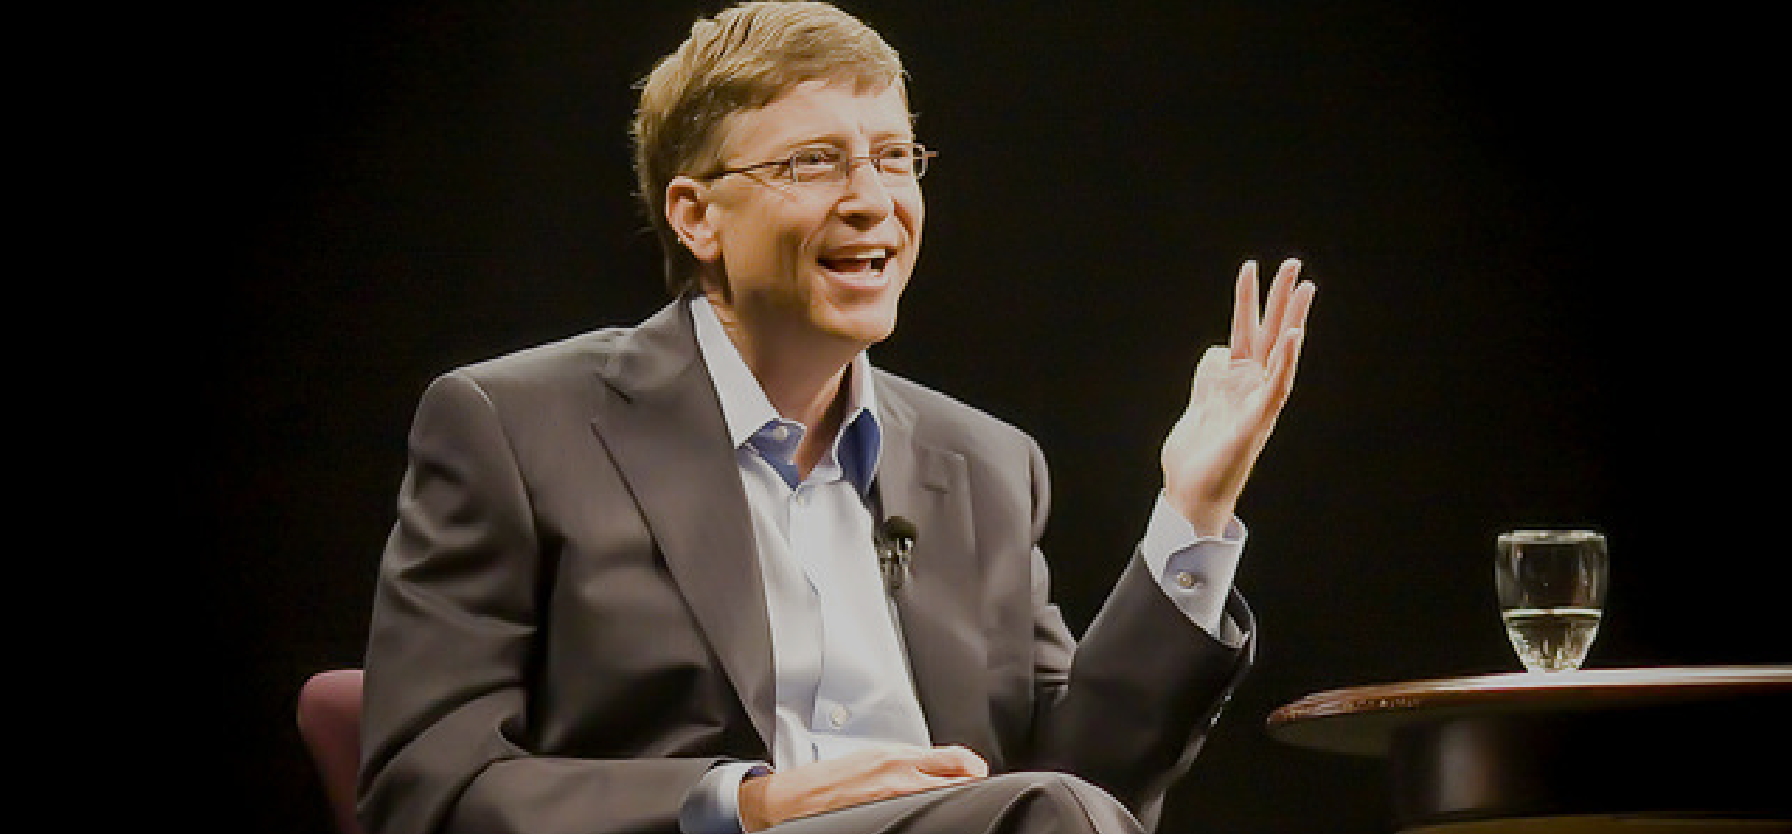 Bill Gates -Inspiring entrepreneurs